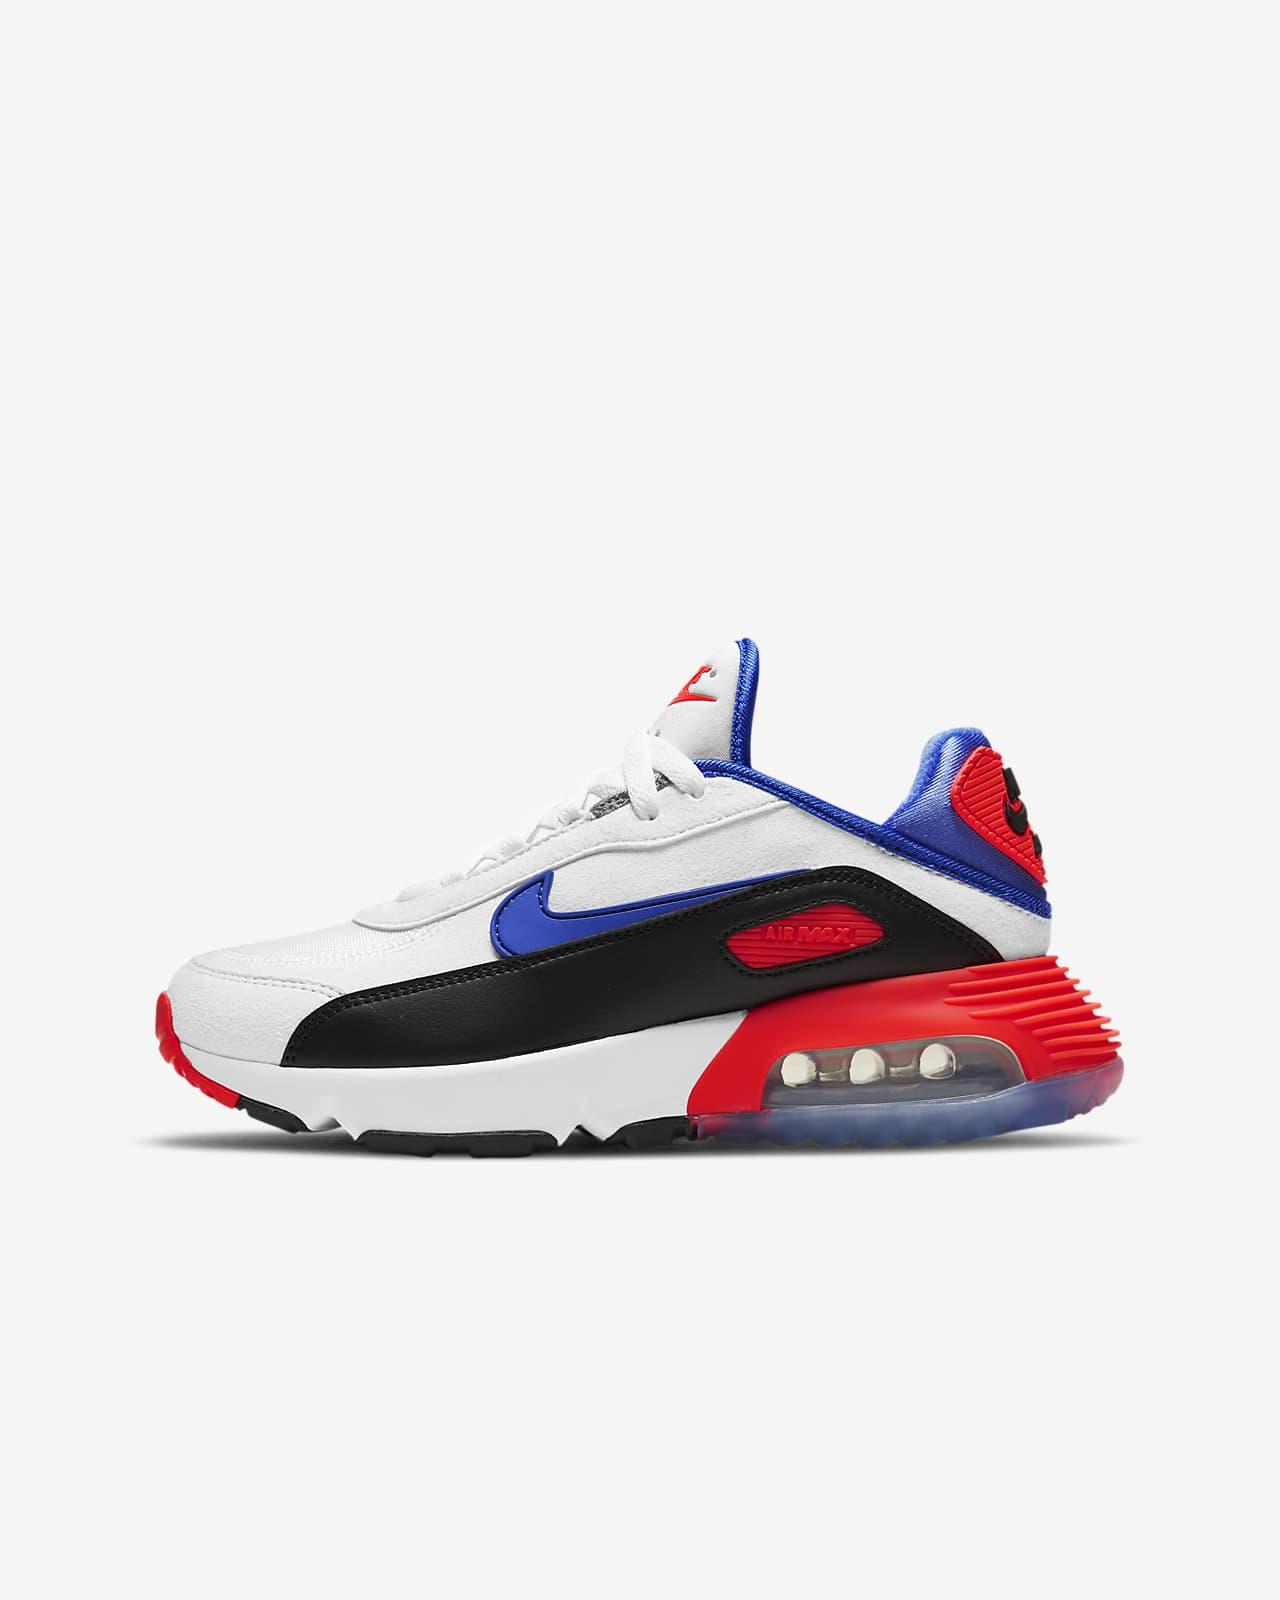 Buty dla dużych dzieci Nike Air Max 2090 EOI